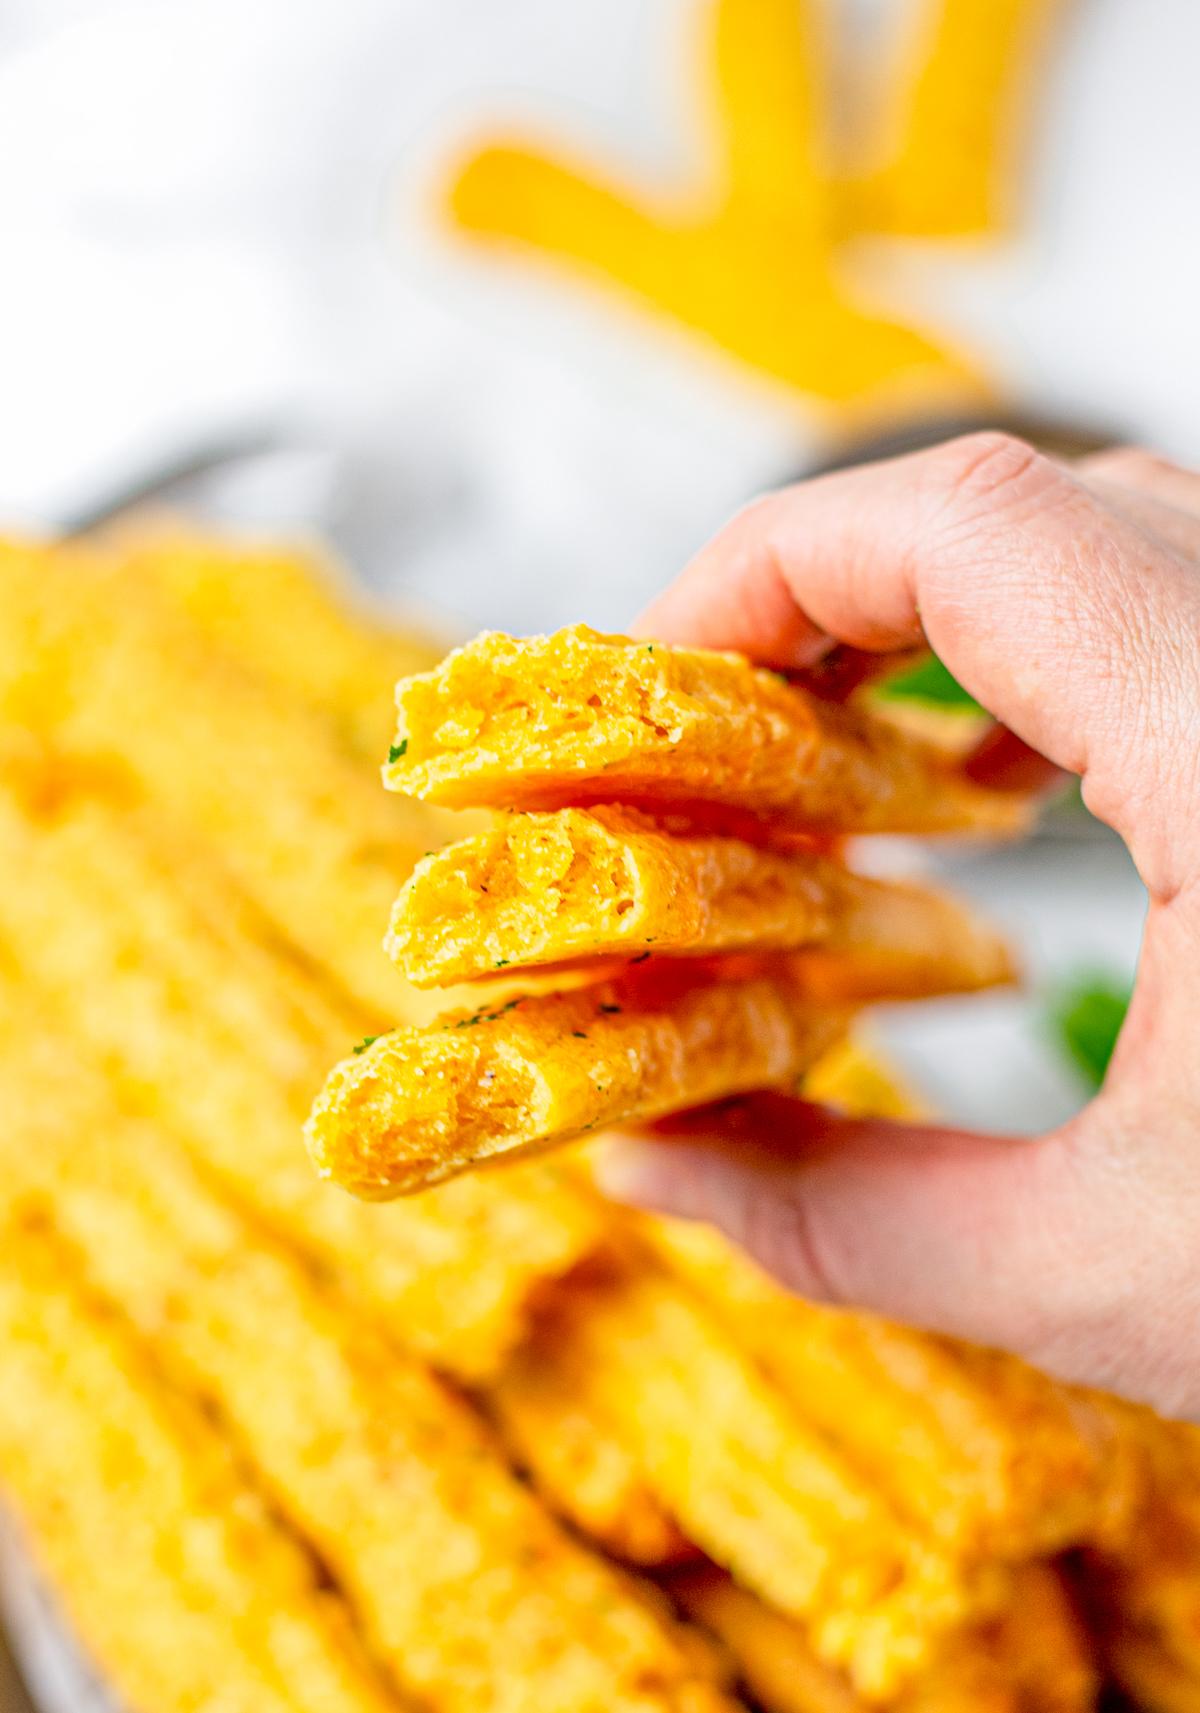 Hand holding up Cheese Straws broken in half.